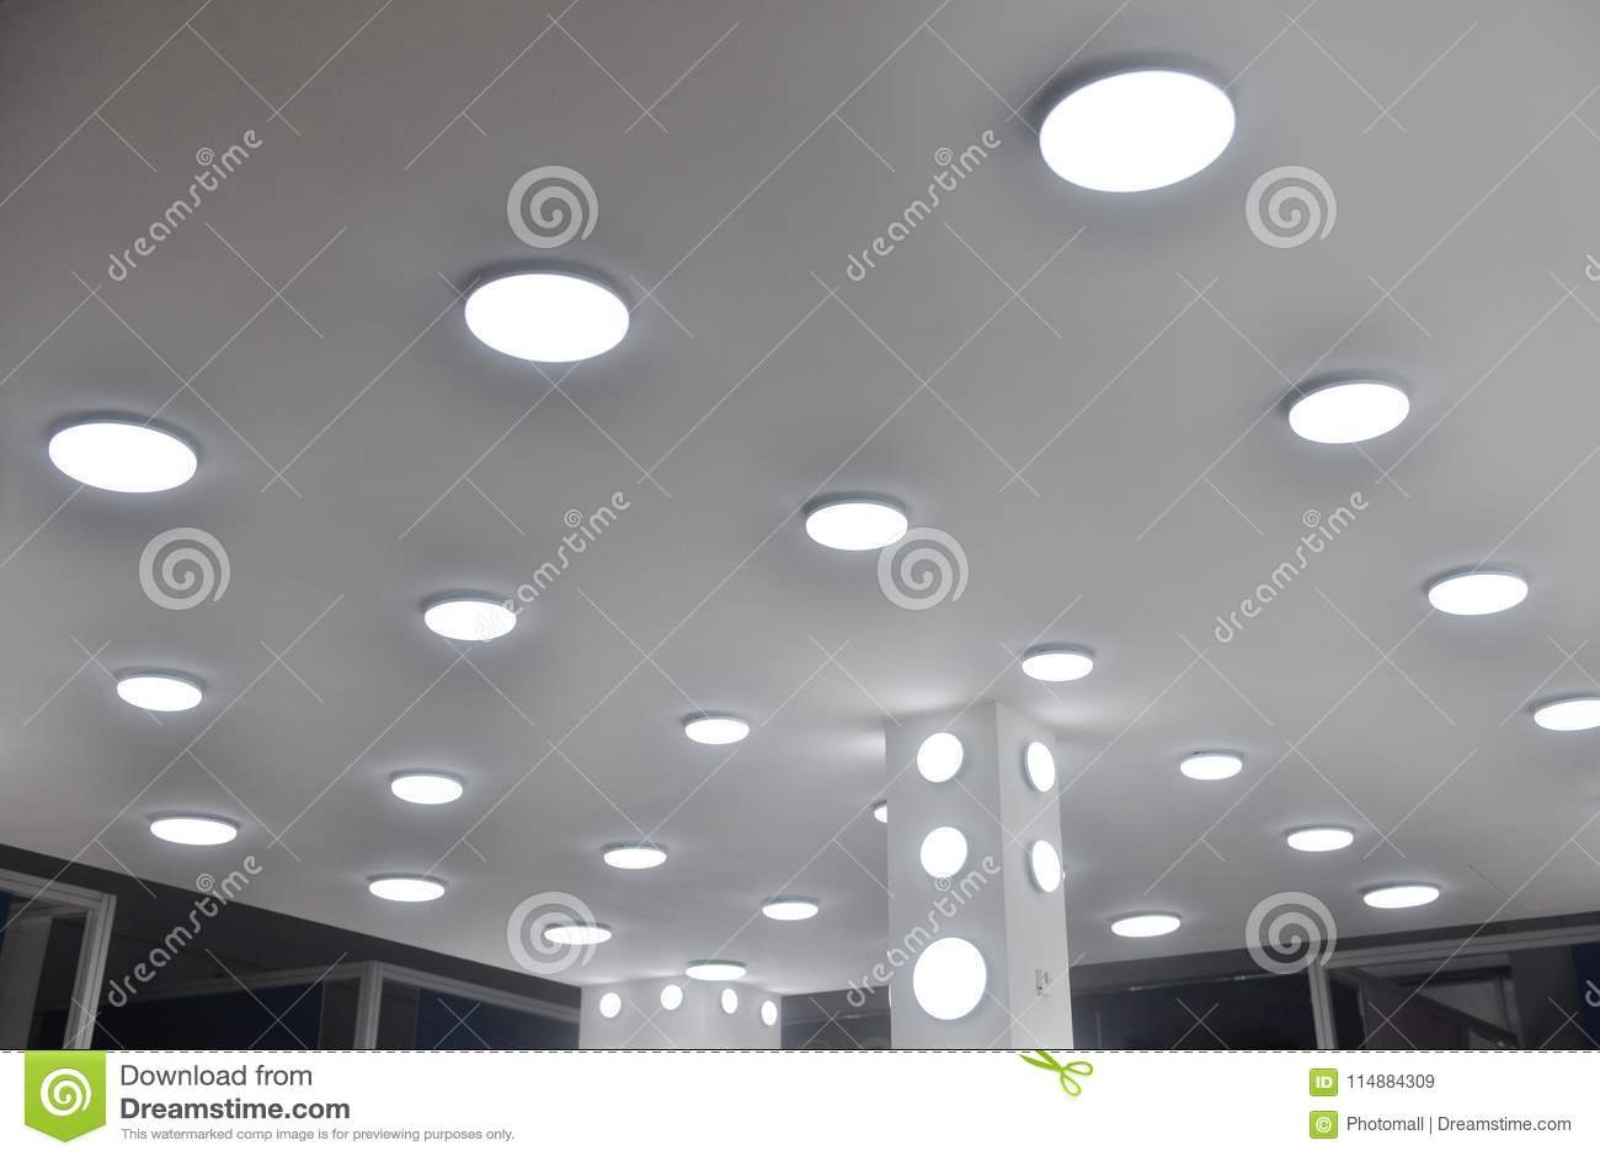 Led ceiling light bulbs stock image image of graphic 114884309 download led ceiling light bulbs stock image image of graphic 114884309 aloadofball Choice Image